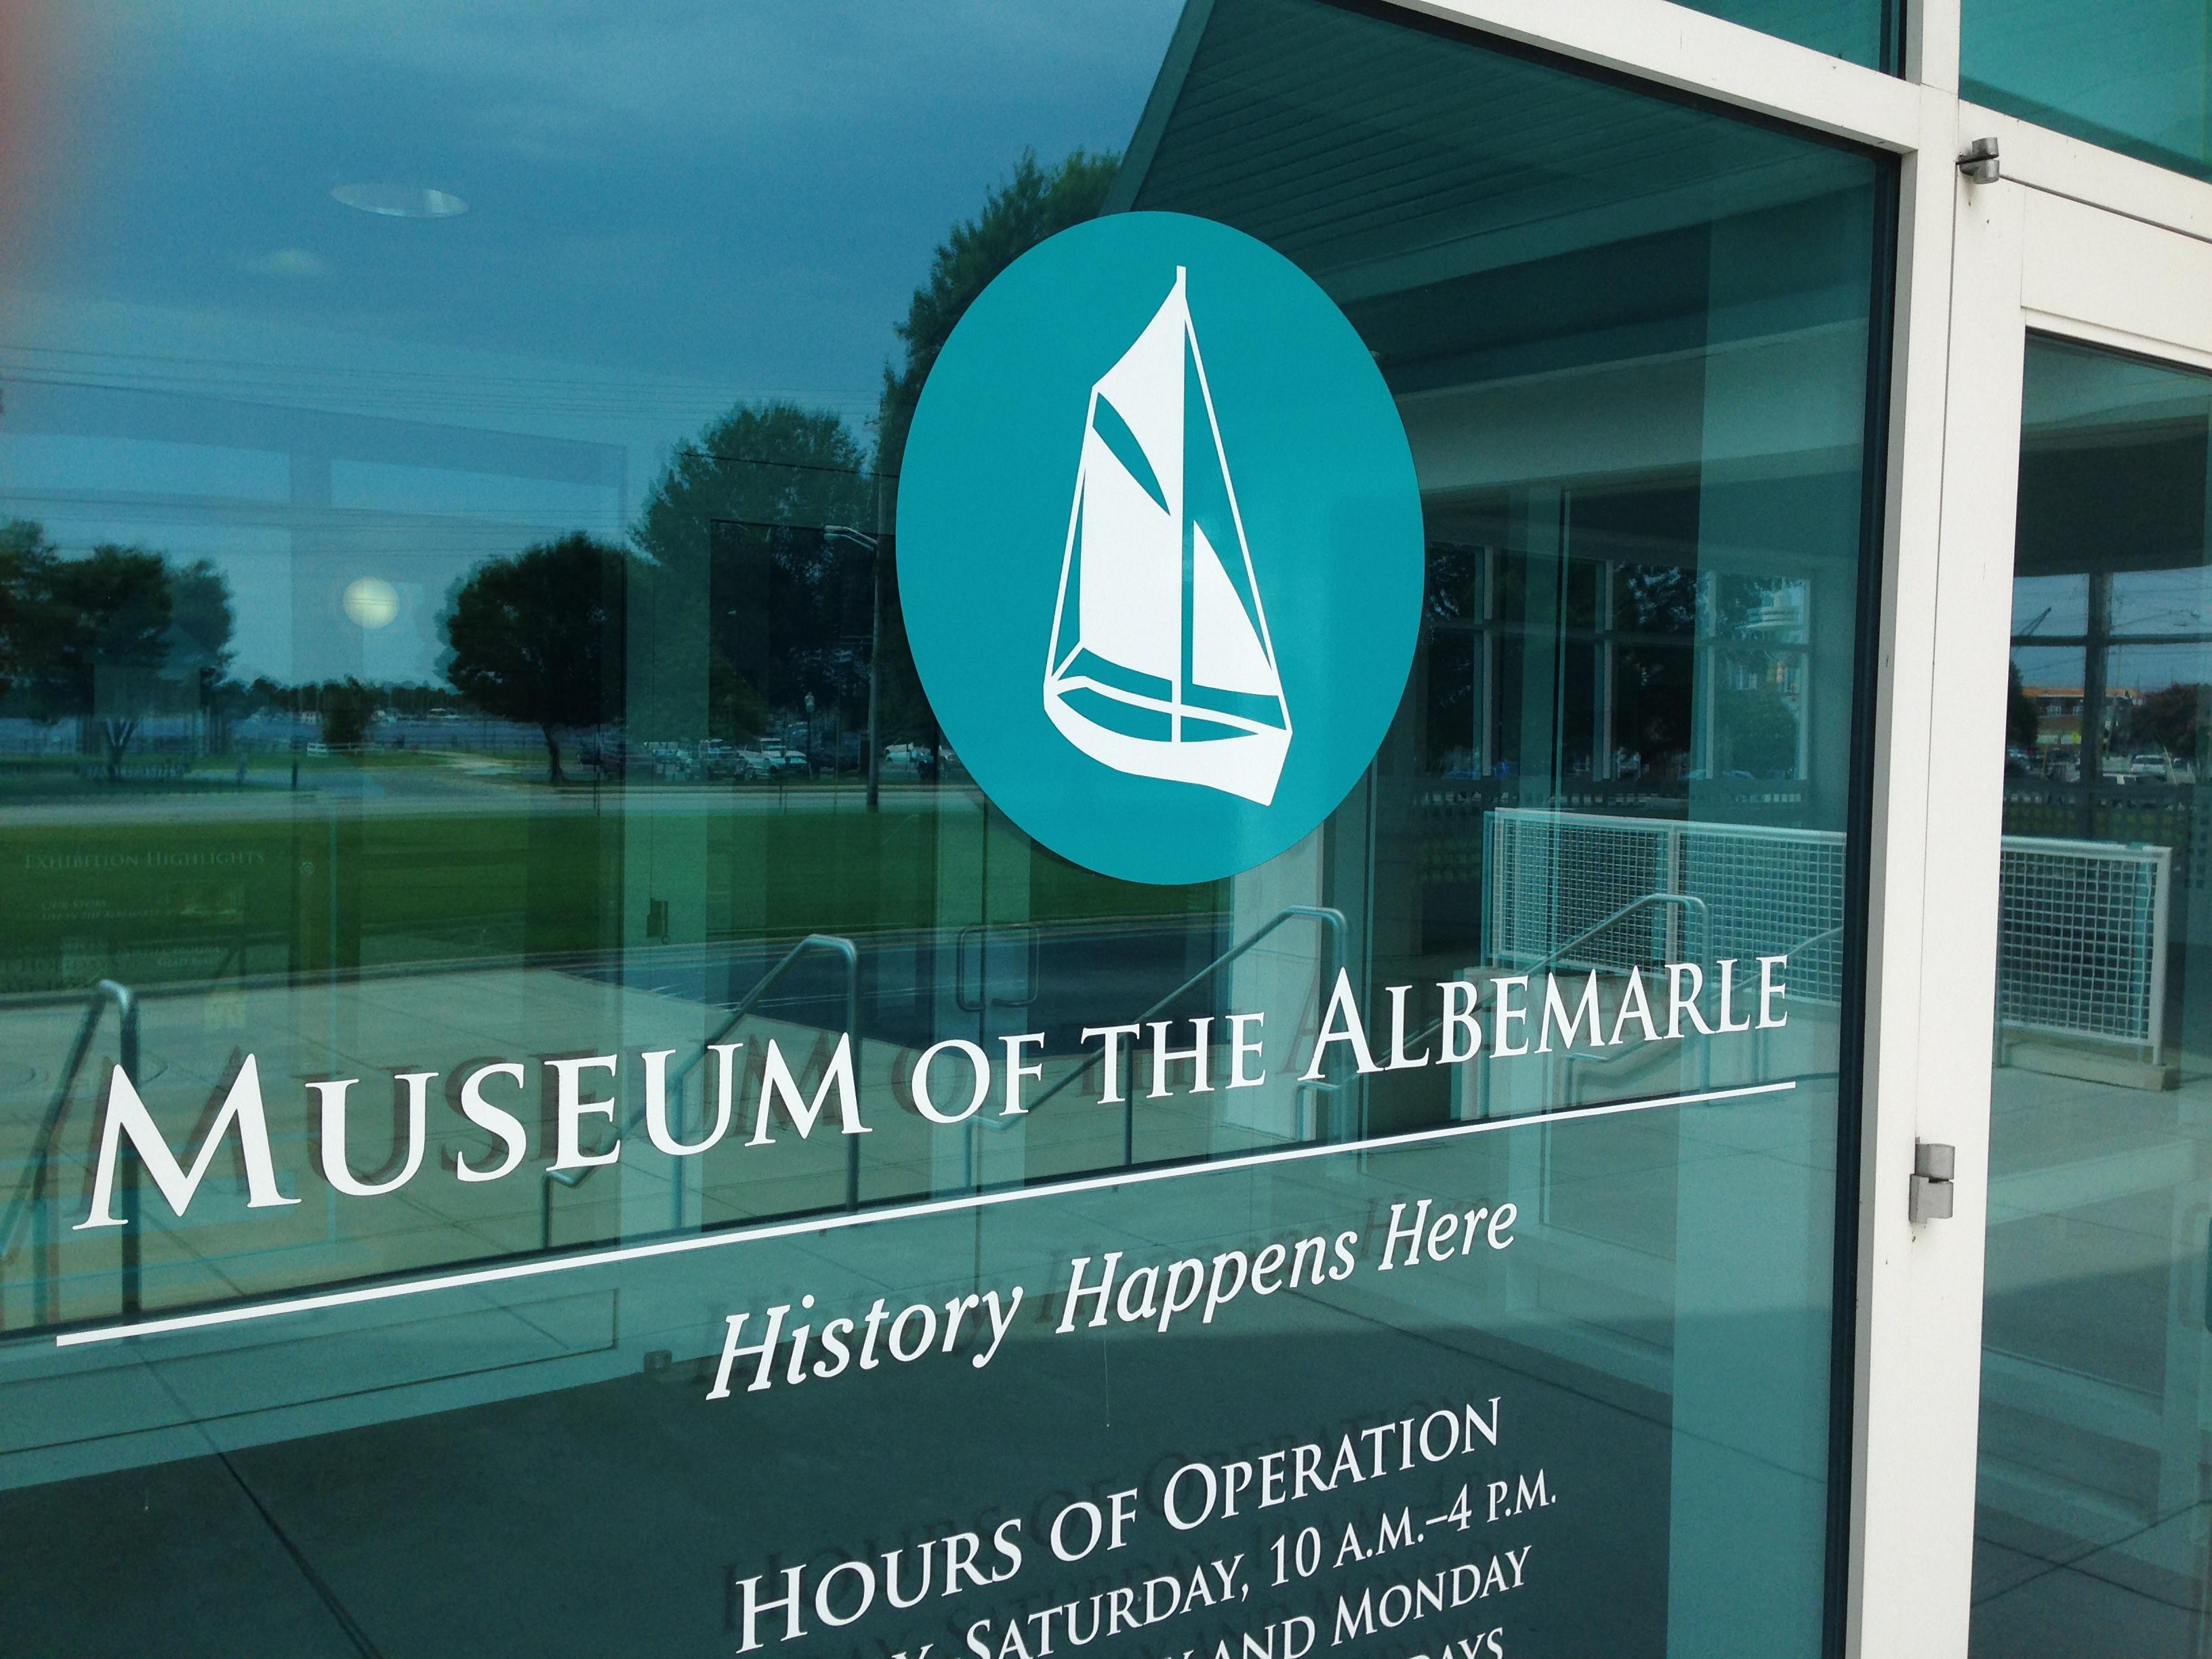 Museum of the Albemarle logo